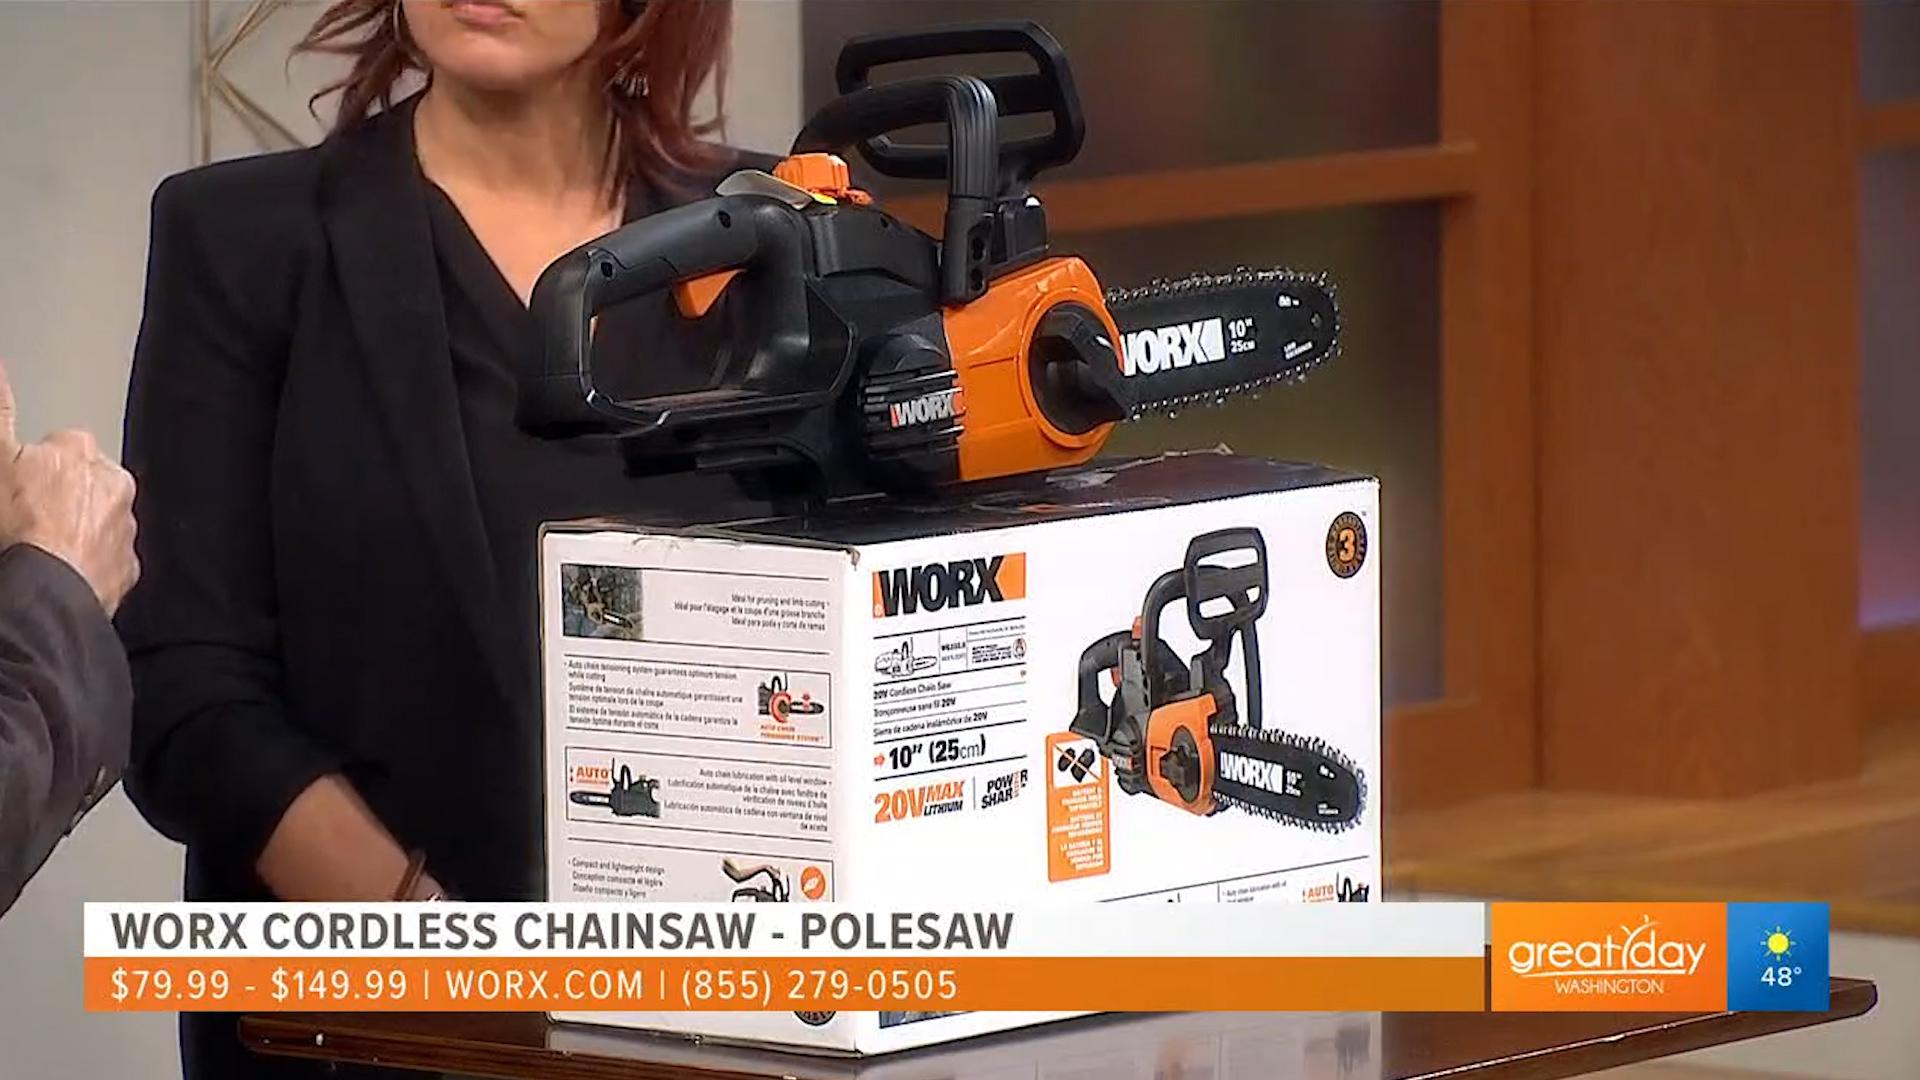 WORX CORDLESS CHAINSAW – POLESAW - $79.99 to $149.99Shop Now